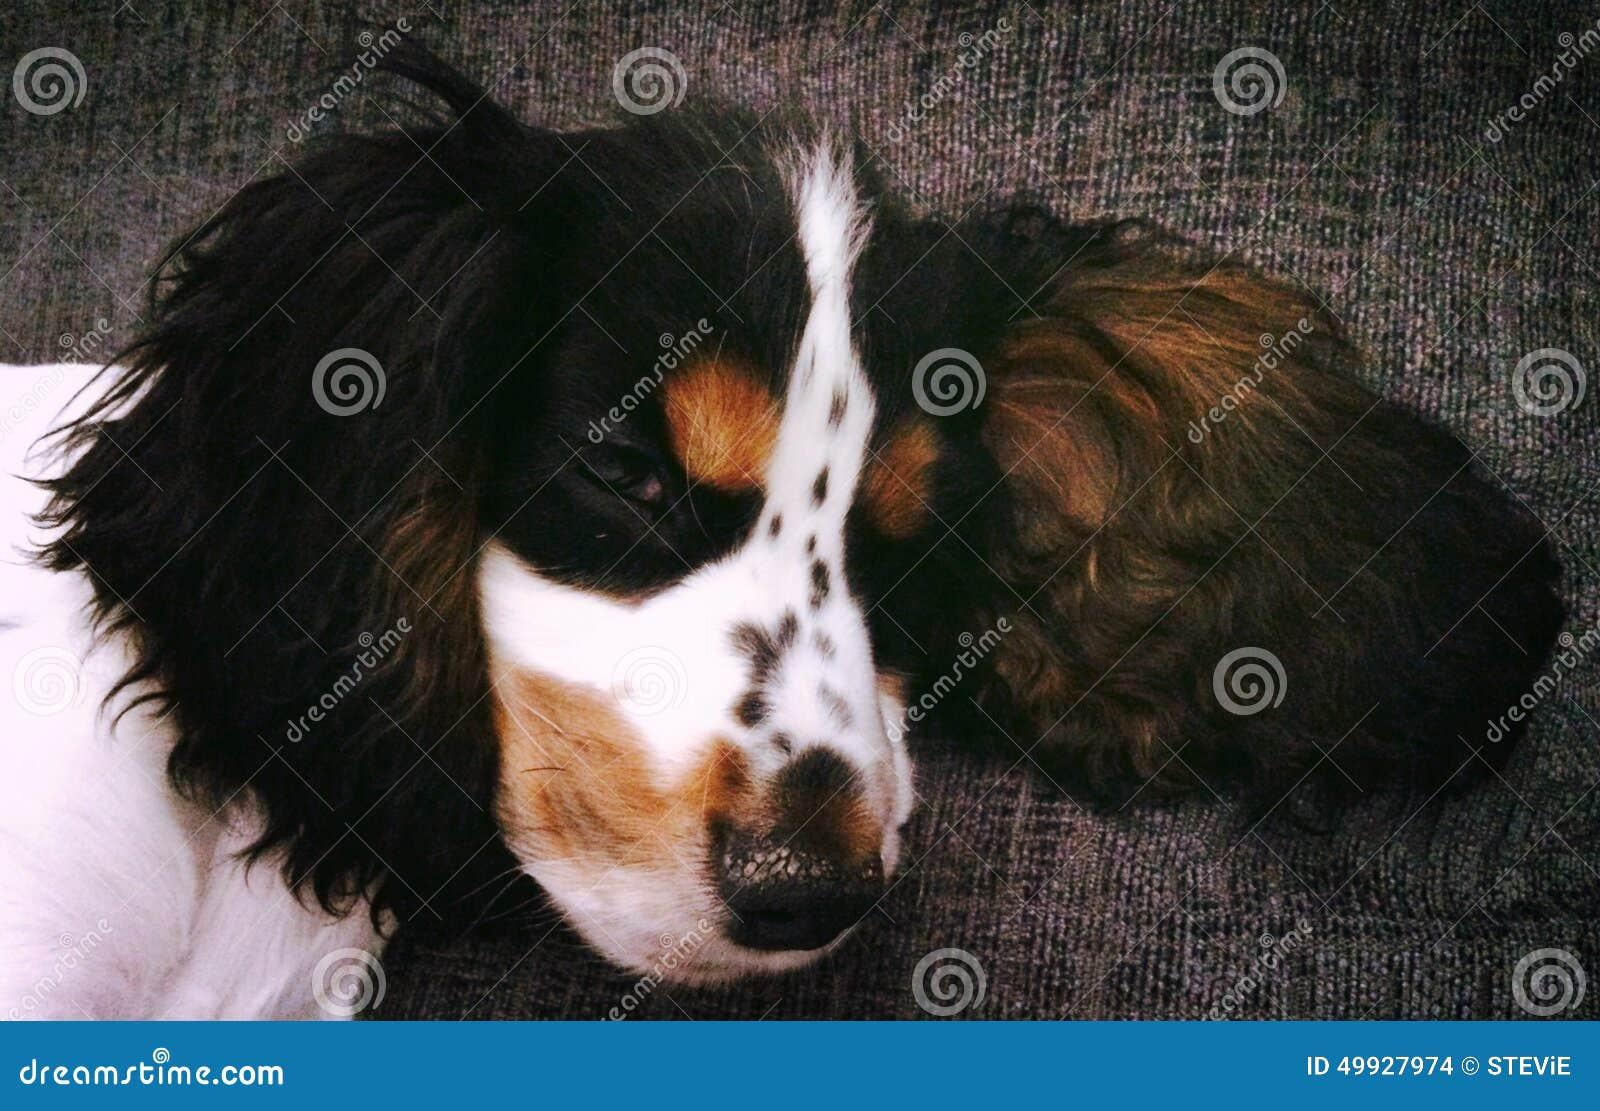 Tri Colour Cocker Spaniel Puppy Stock Photo Image Of Cocker Spaniel 49927974